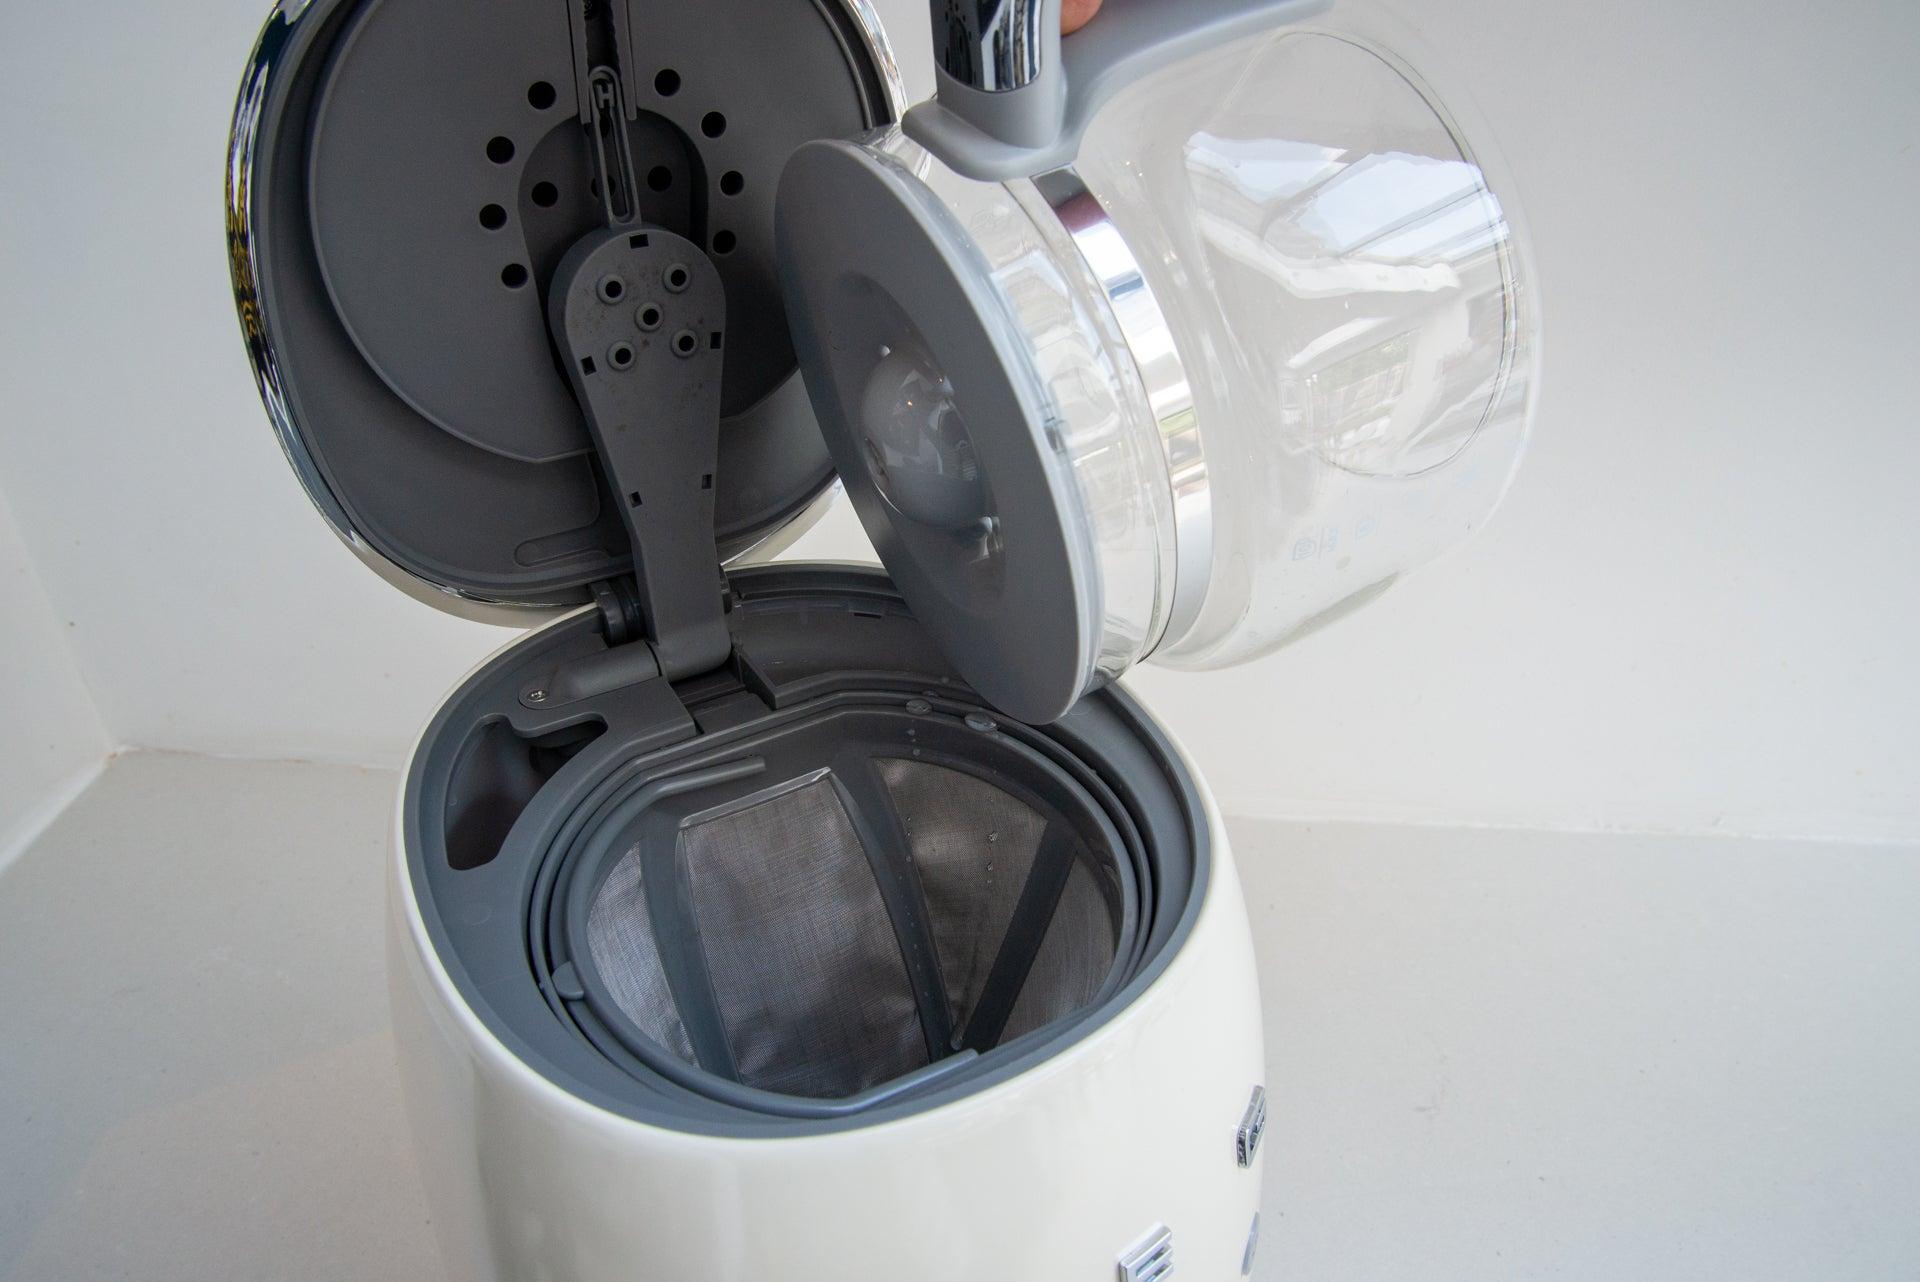 Smeg DCF02 Drip Filter Coffee Machine adding water